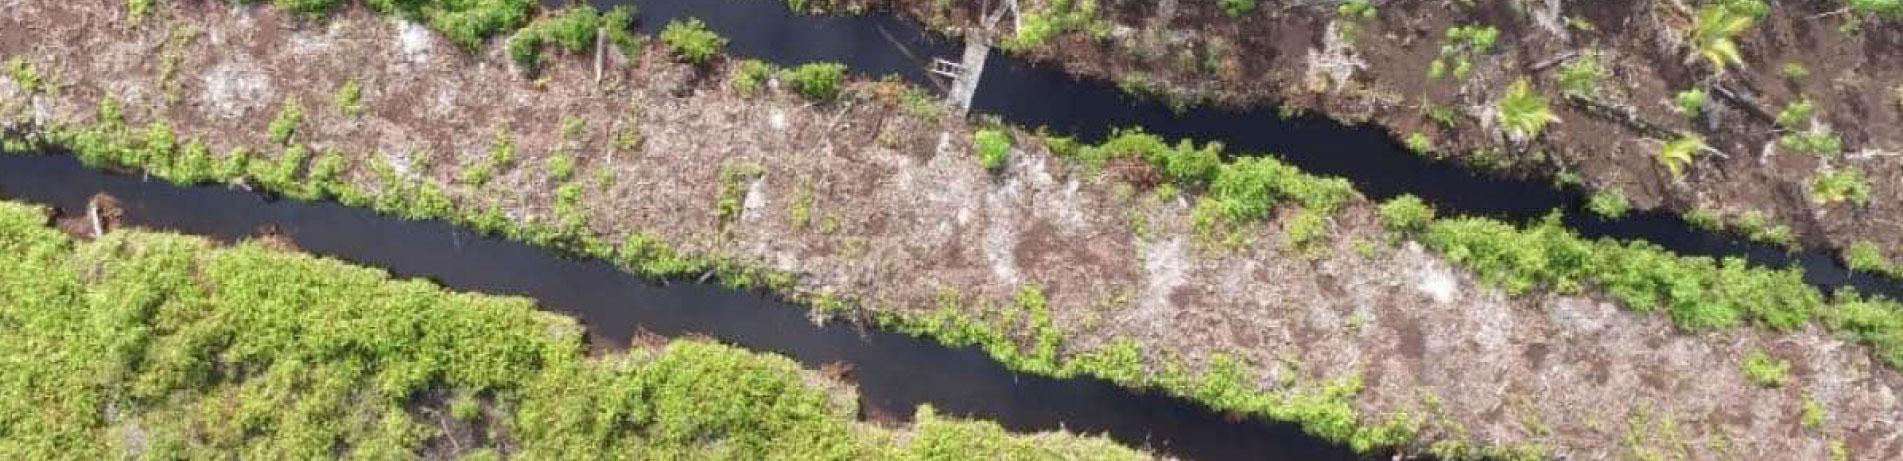 Aerial photo of deforested land, Sebangau National Park, Indonesia